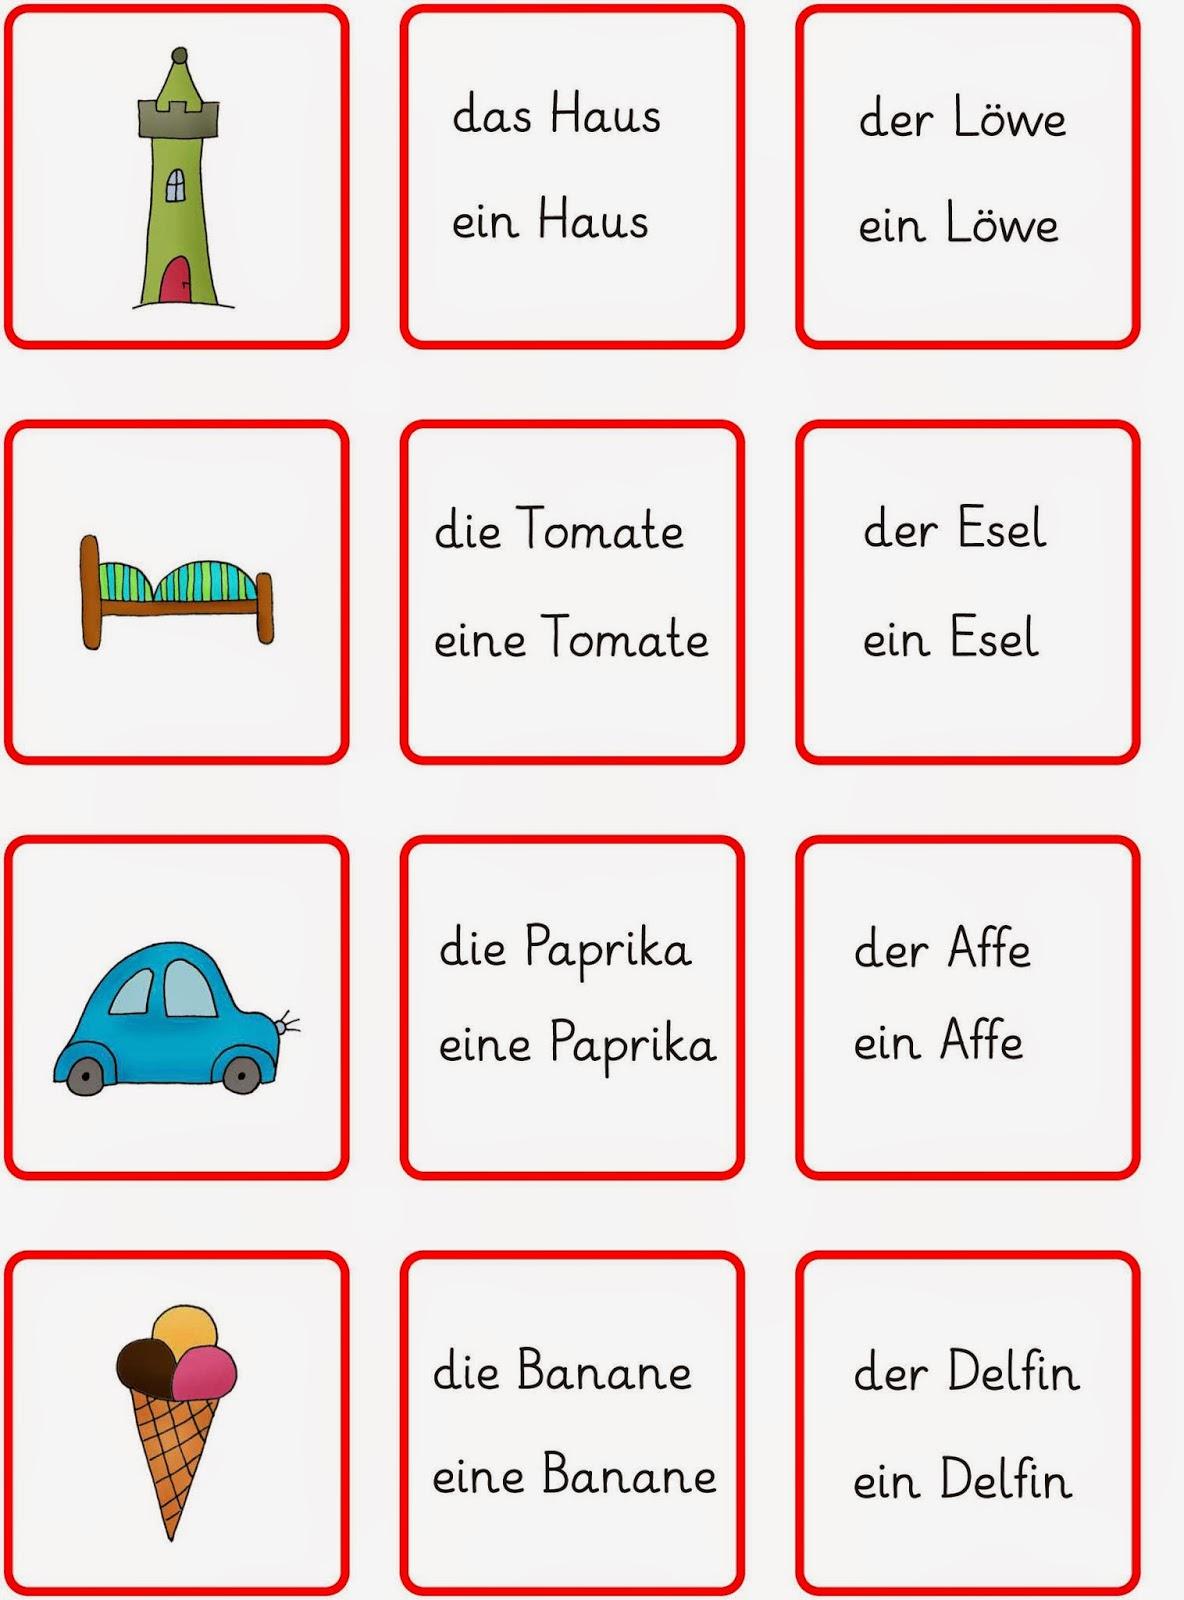 Erfreut Gastfreundschaft Fortsetzen Wörter Ideen - Entry Level ...